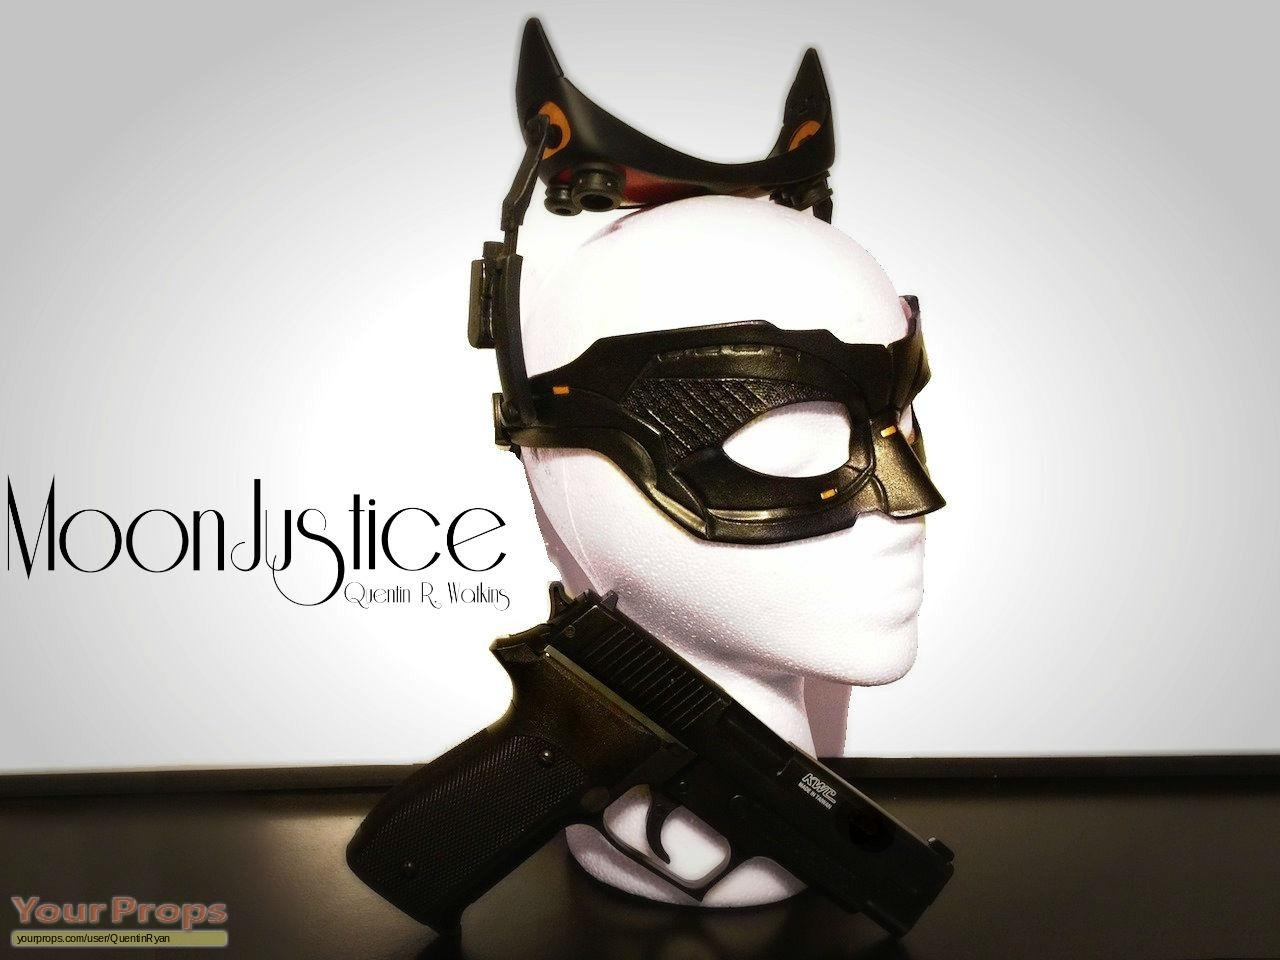 09725b5b63 The Dark Knight Rises Replica Movie Prop ... image number 3 of the dark  knight catwoman costume ...